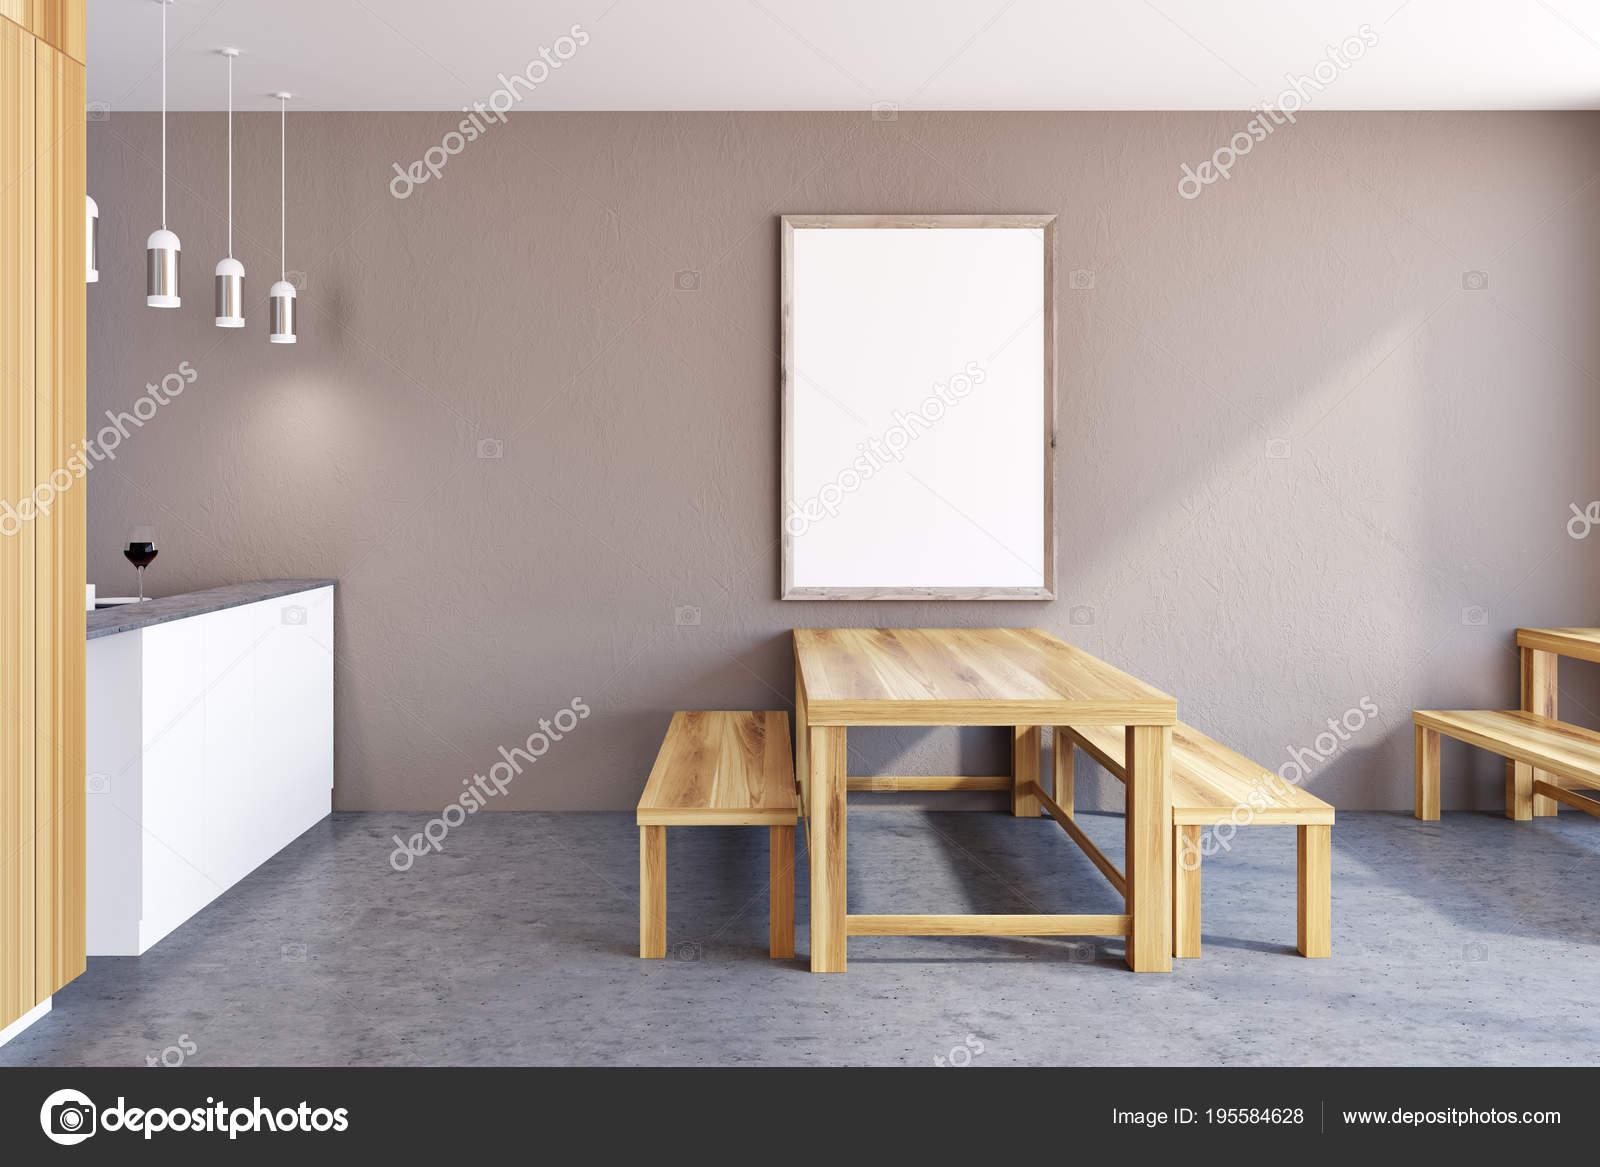 bench for kitchen table salvaged cabinets sale 乡村厨房内饰 框架海报 图库照片 c denisismagilov 195584628 乡村餐厅内部有一张巨大的桌子 两个长凳和一张竖着的框架海报在墙上 3d 渲染模拟 照片作者denisismagilov